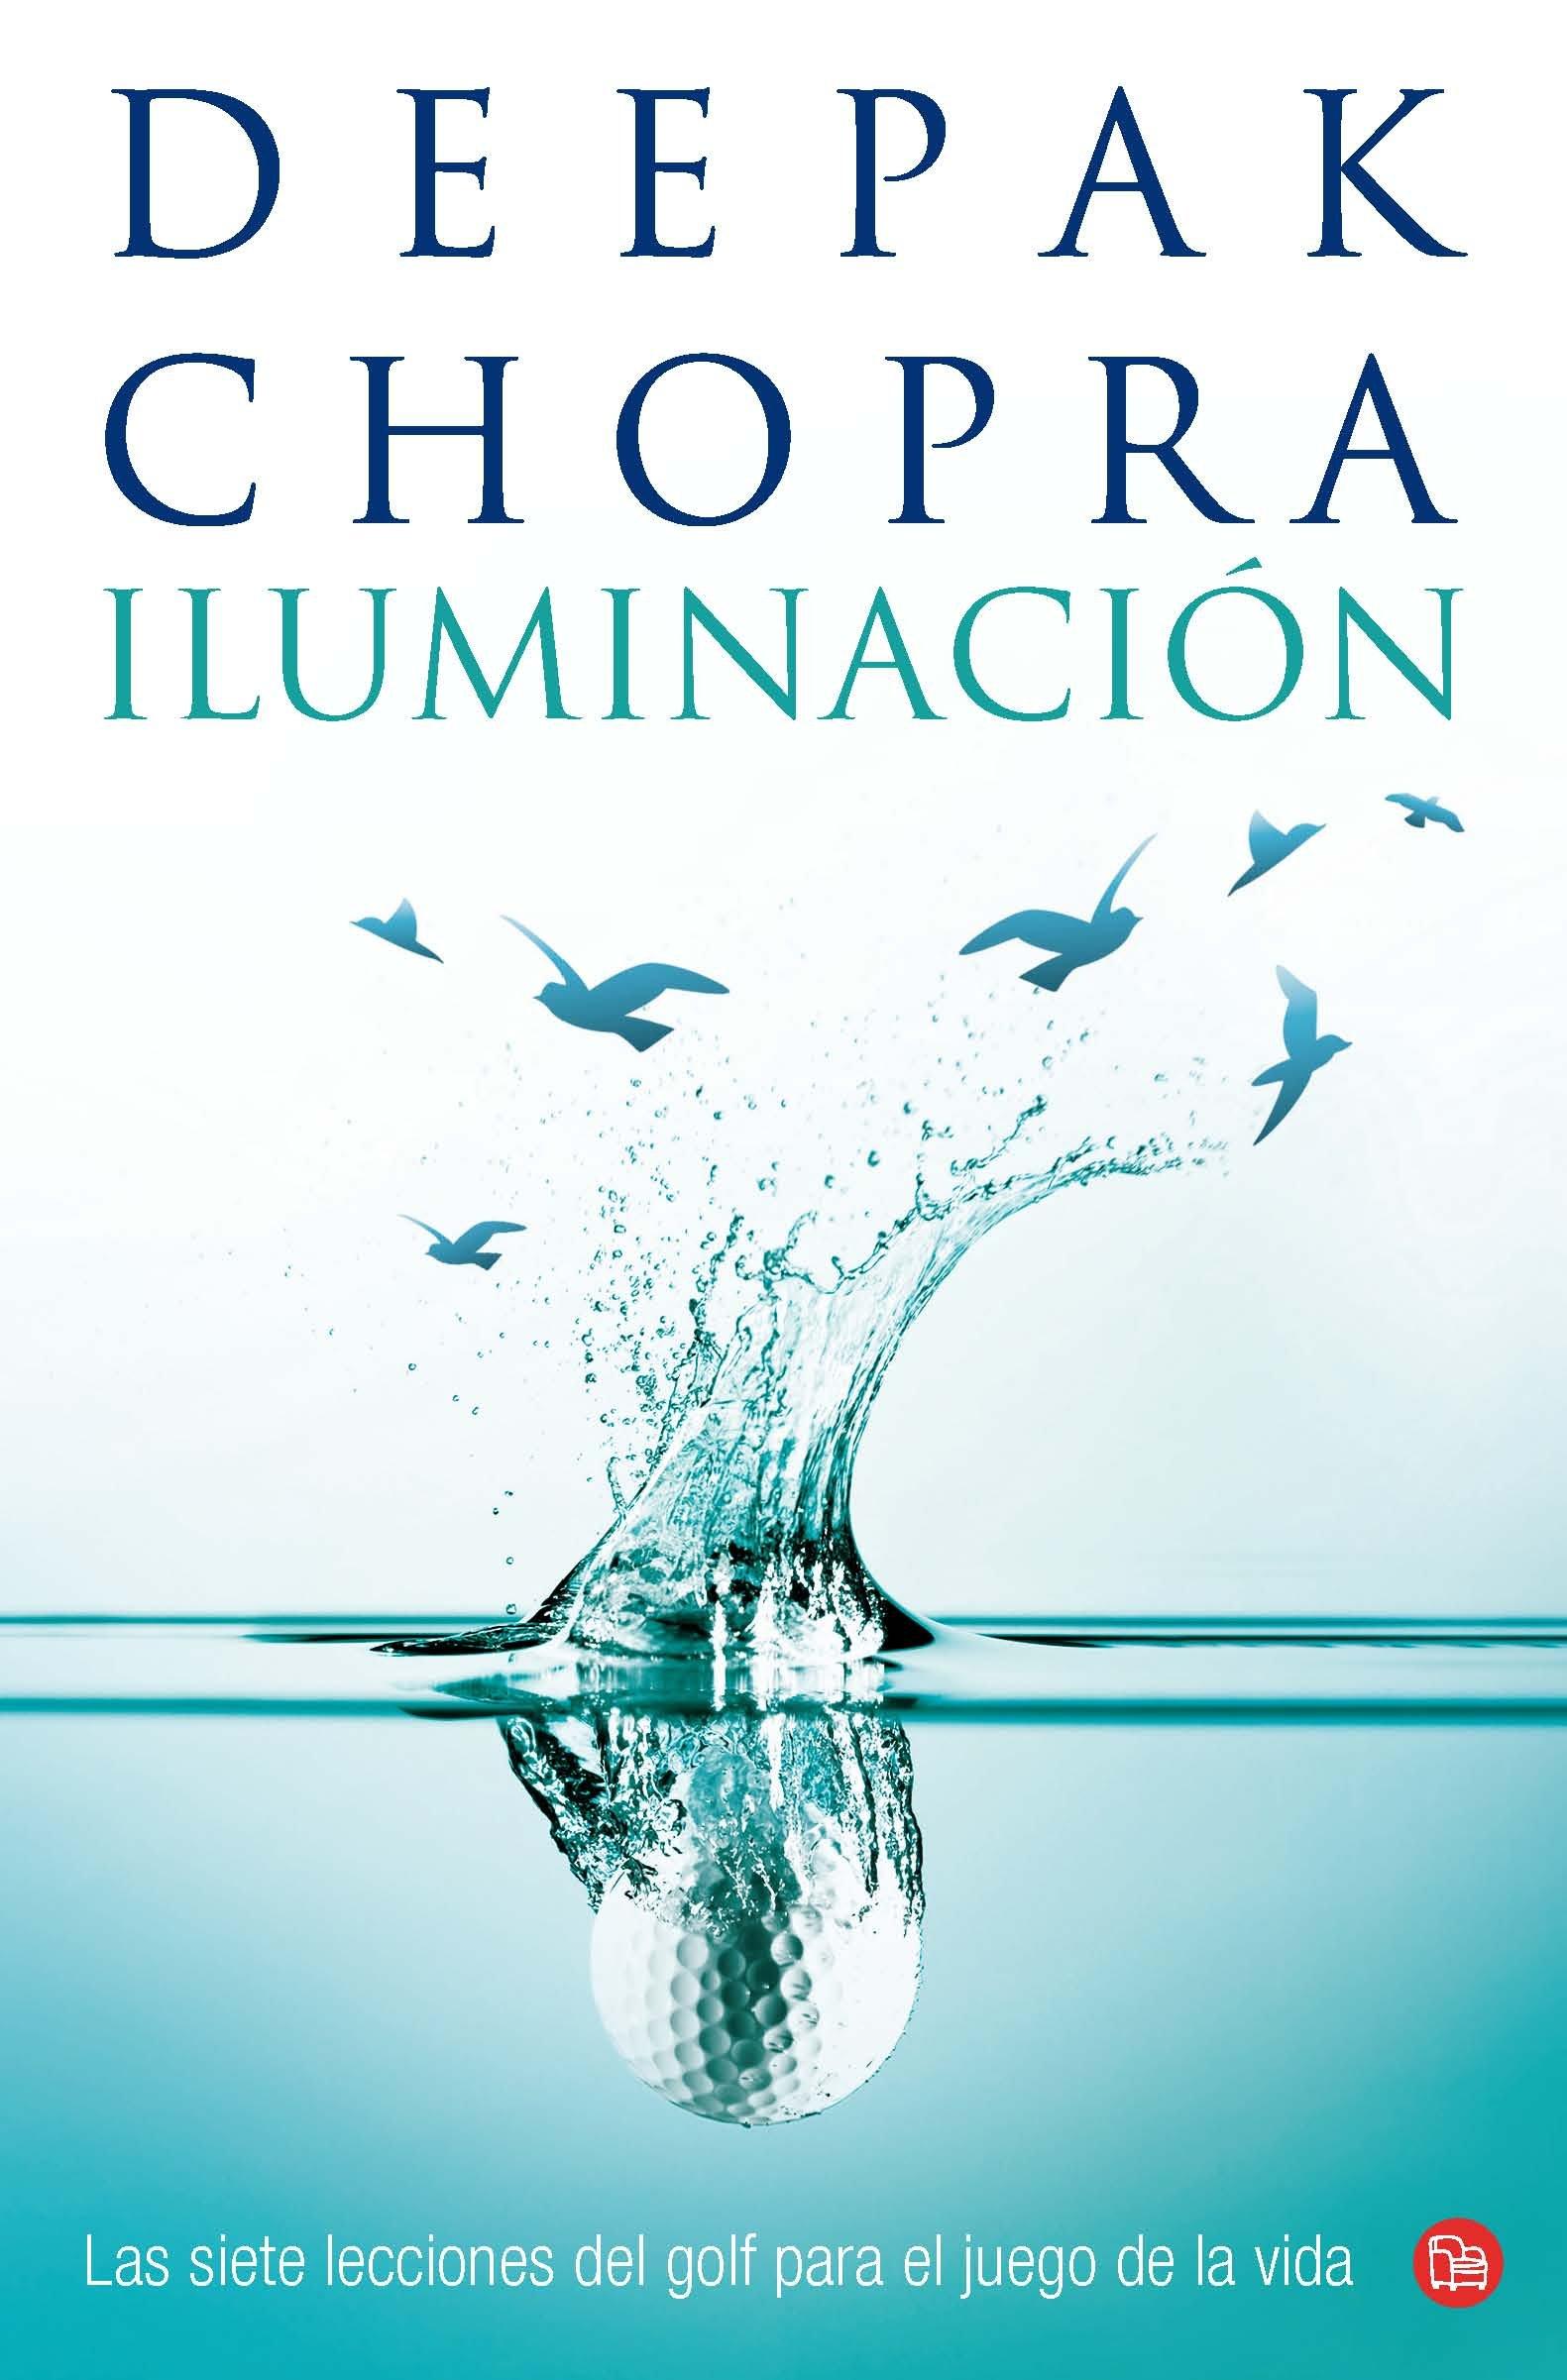 Iluminación (Golf for Enlightenment) (Spanish Edition): Deepak Chopra:  9786071109989: Amazon.com: Books